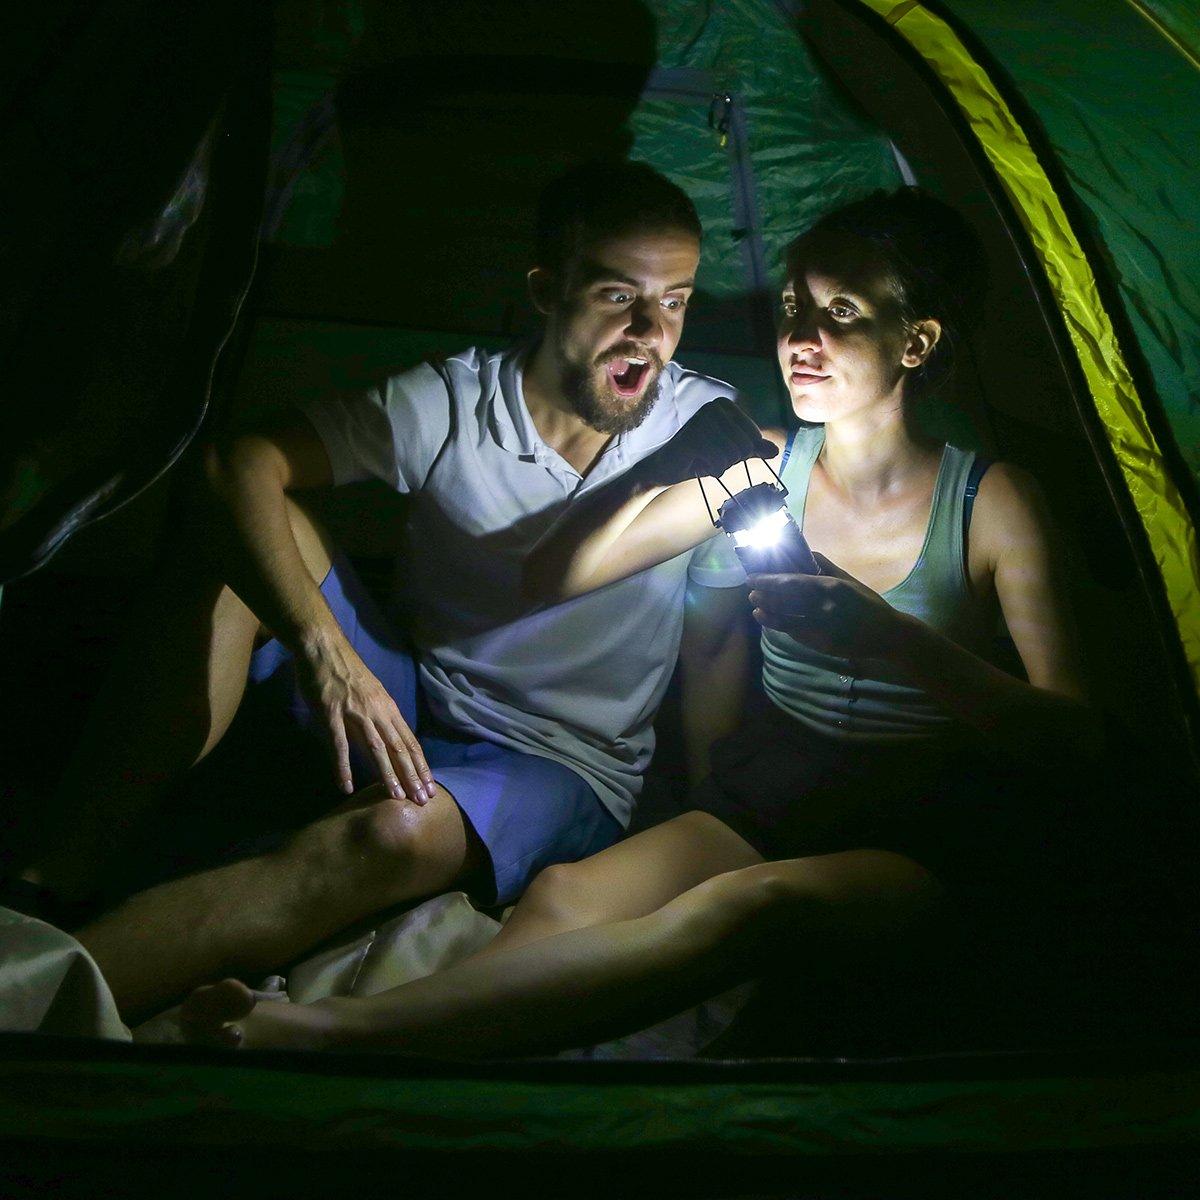 Ausf/älle usw 30 LEDs Batteriebetrieben Campinglampe 4er Pack Notfall Faltbare Camping H/ängelampe geeignet f/ür Angeln LE Camping Laterne Abenteuer Wandern